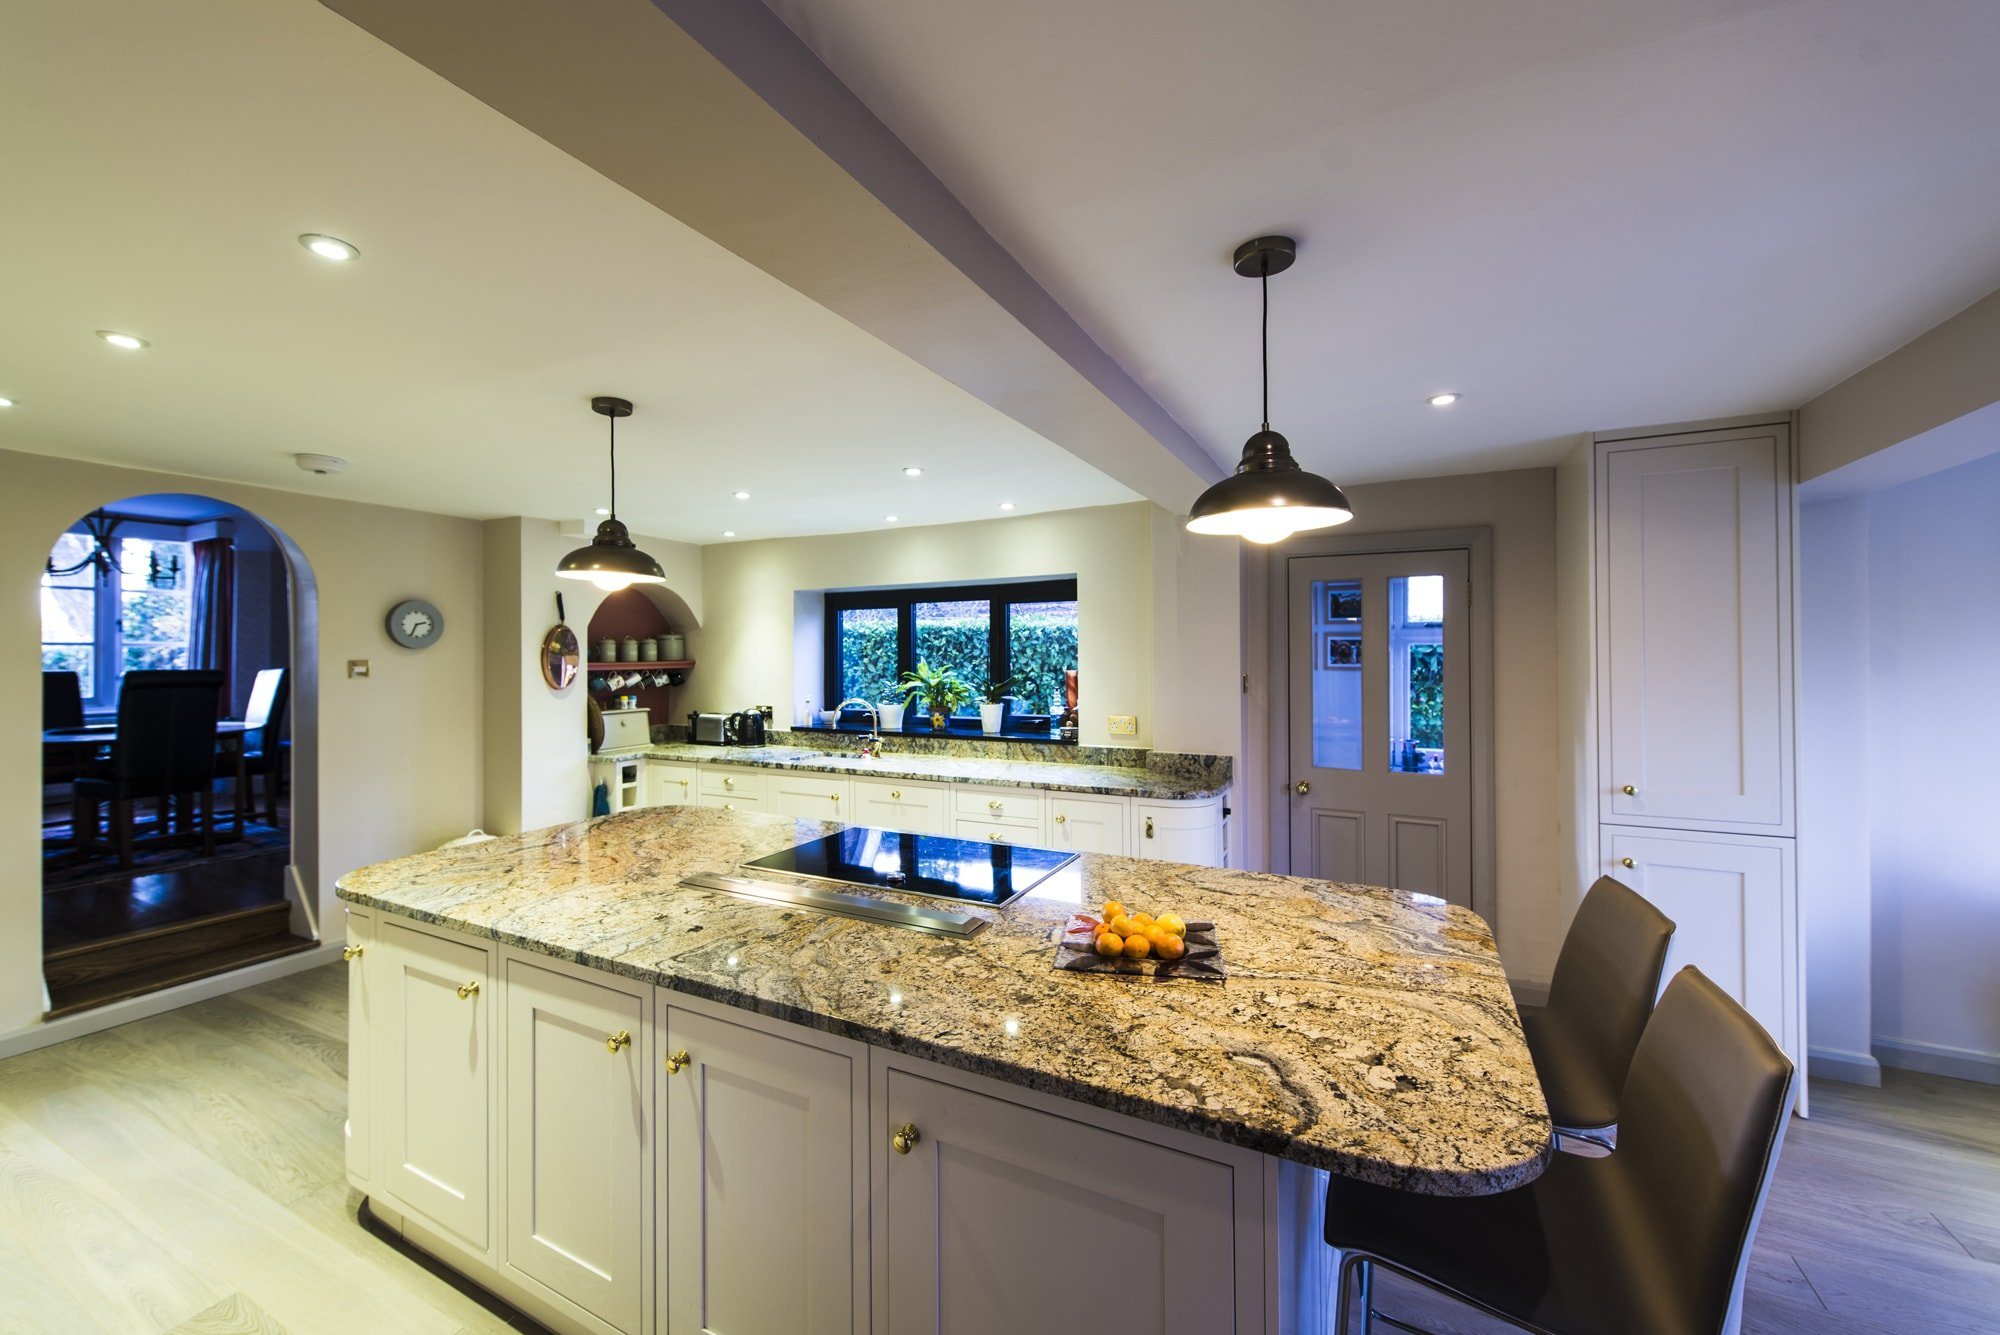 paisley-gold-granite-betchworth-surrey-15335110-island-min